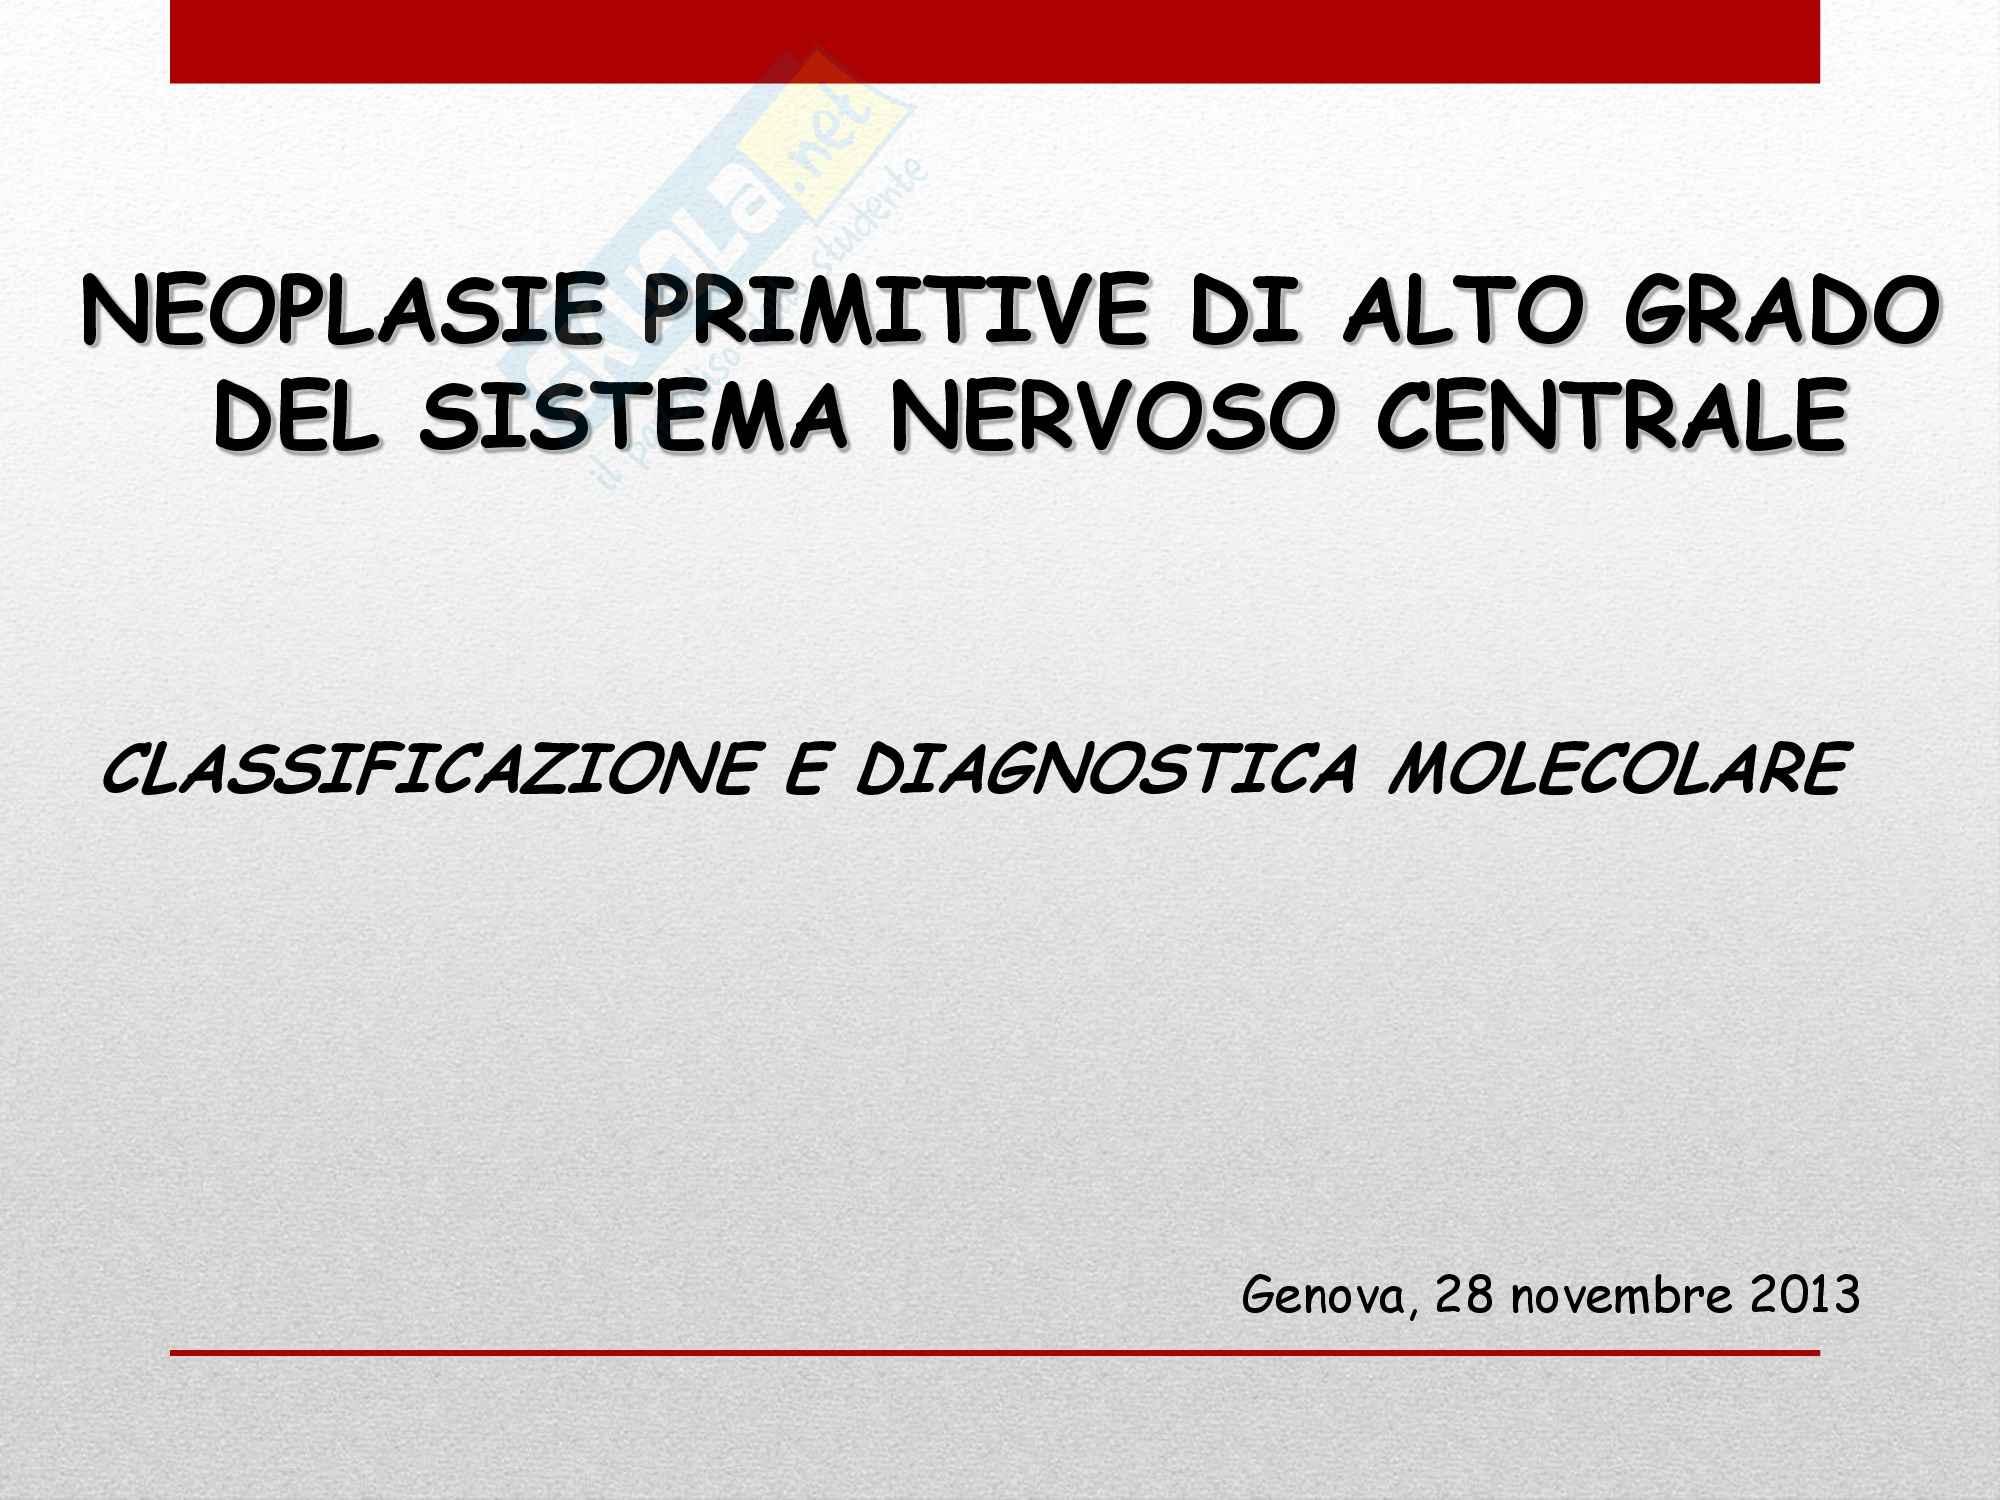 Neuropatologia, Anatomia patologica